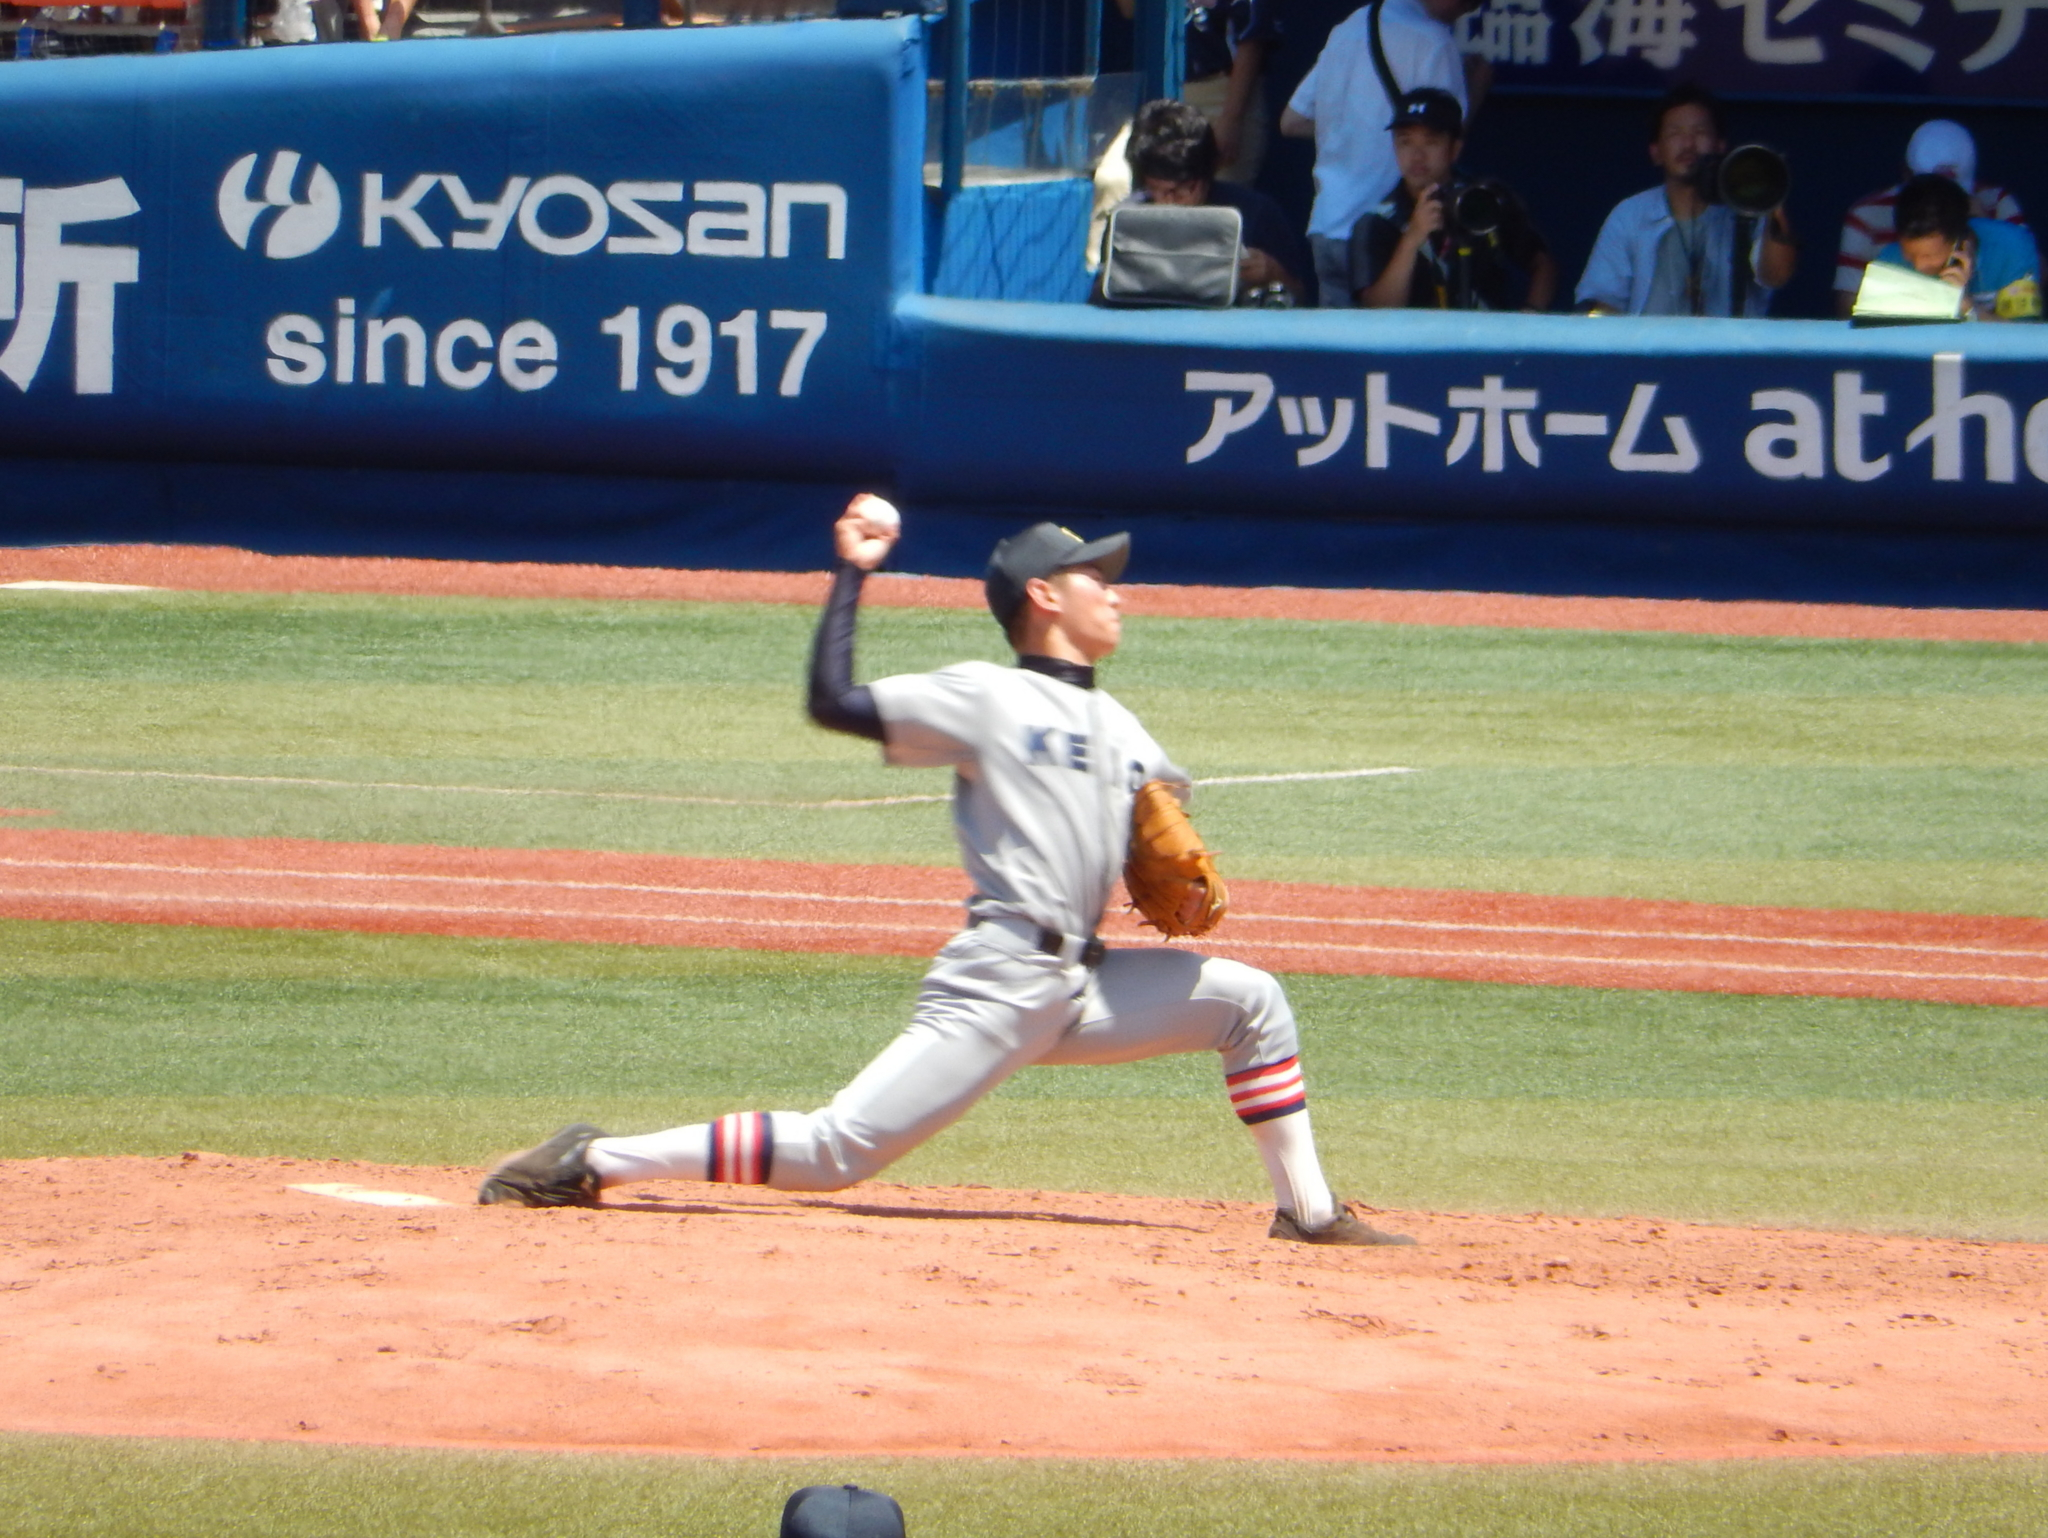 f:id:ToshUeno:20160730121625j:plain